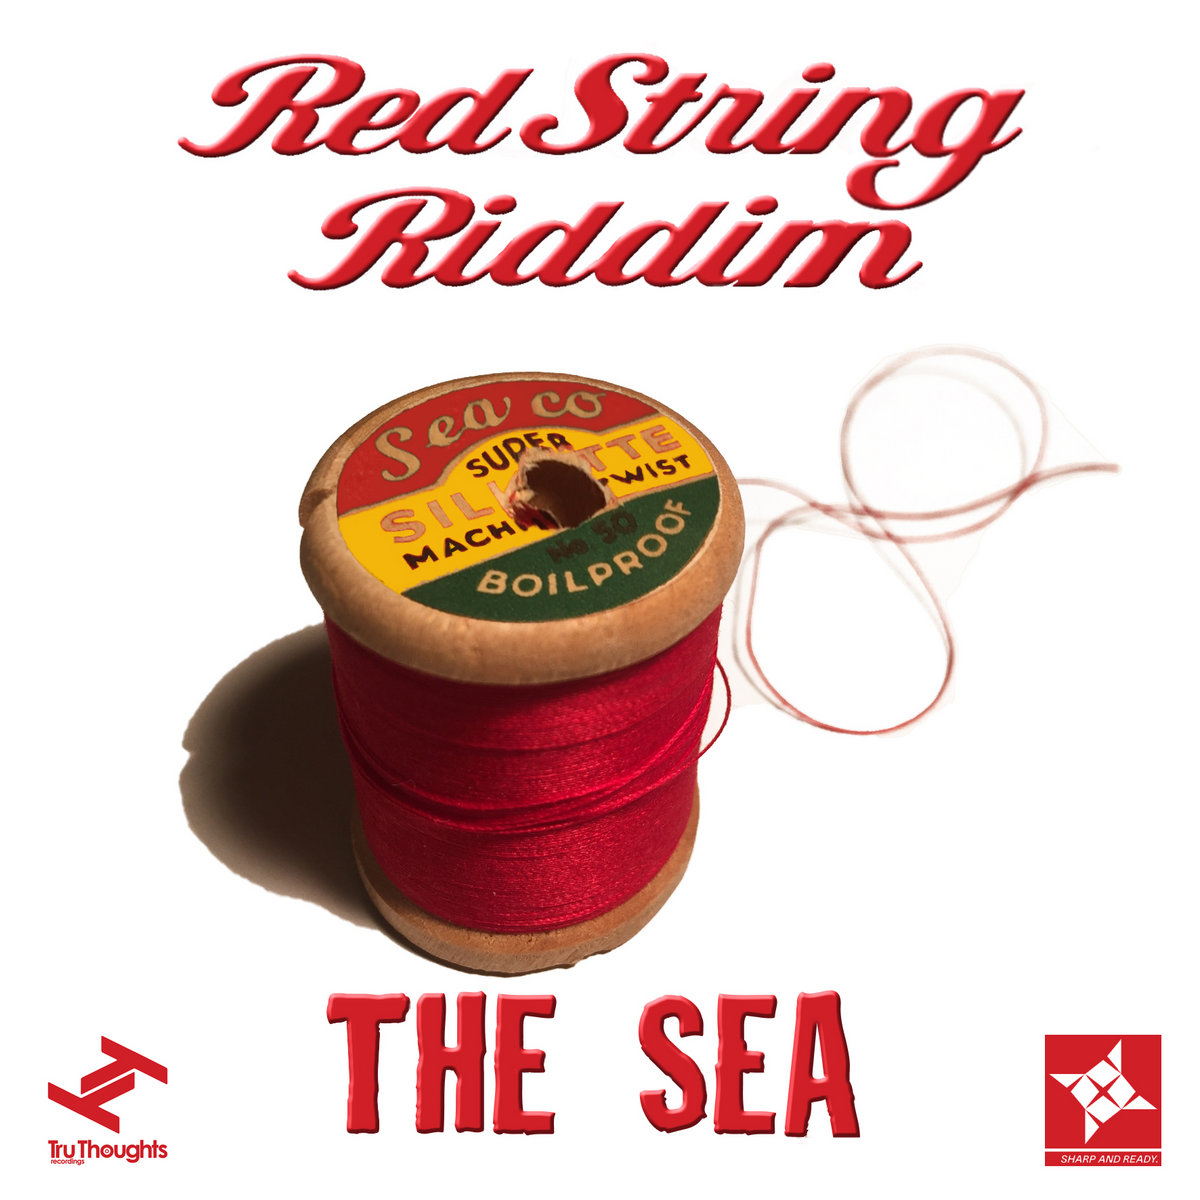 Red String Riddim (Instrumental) | The Sea